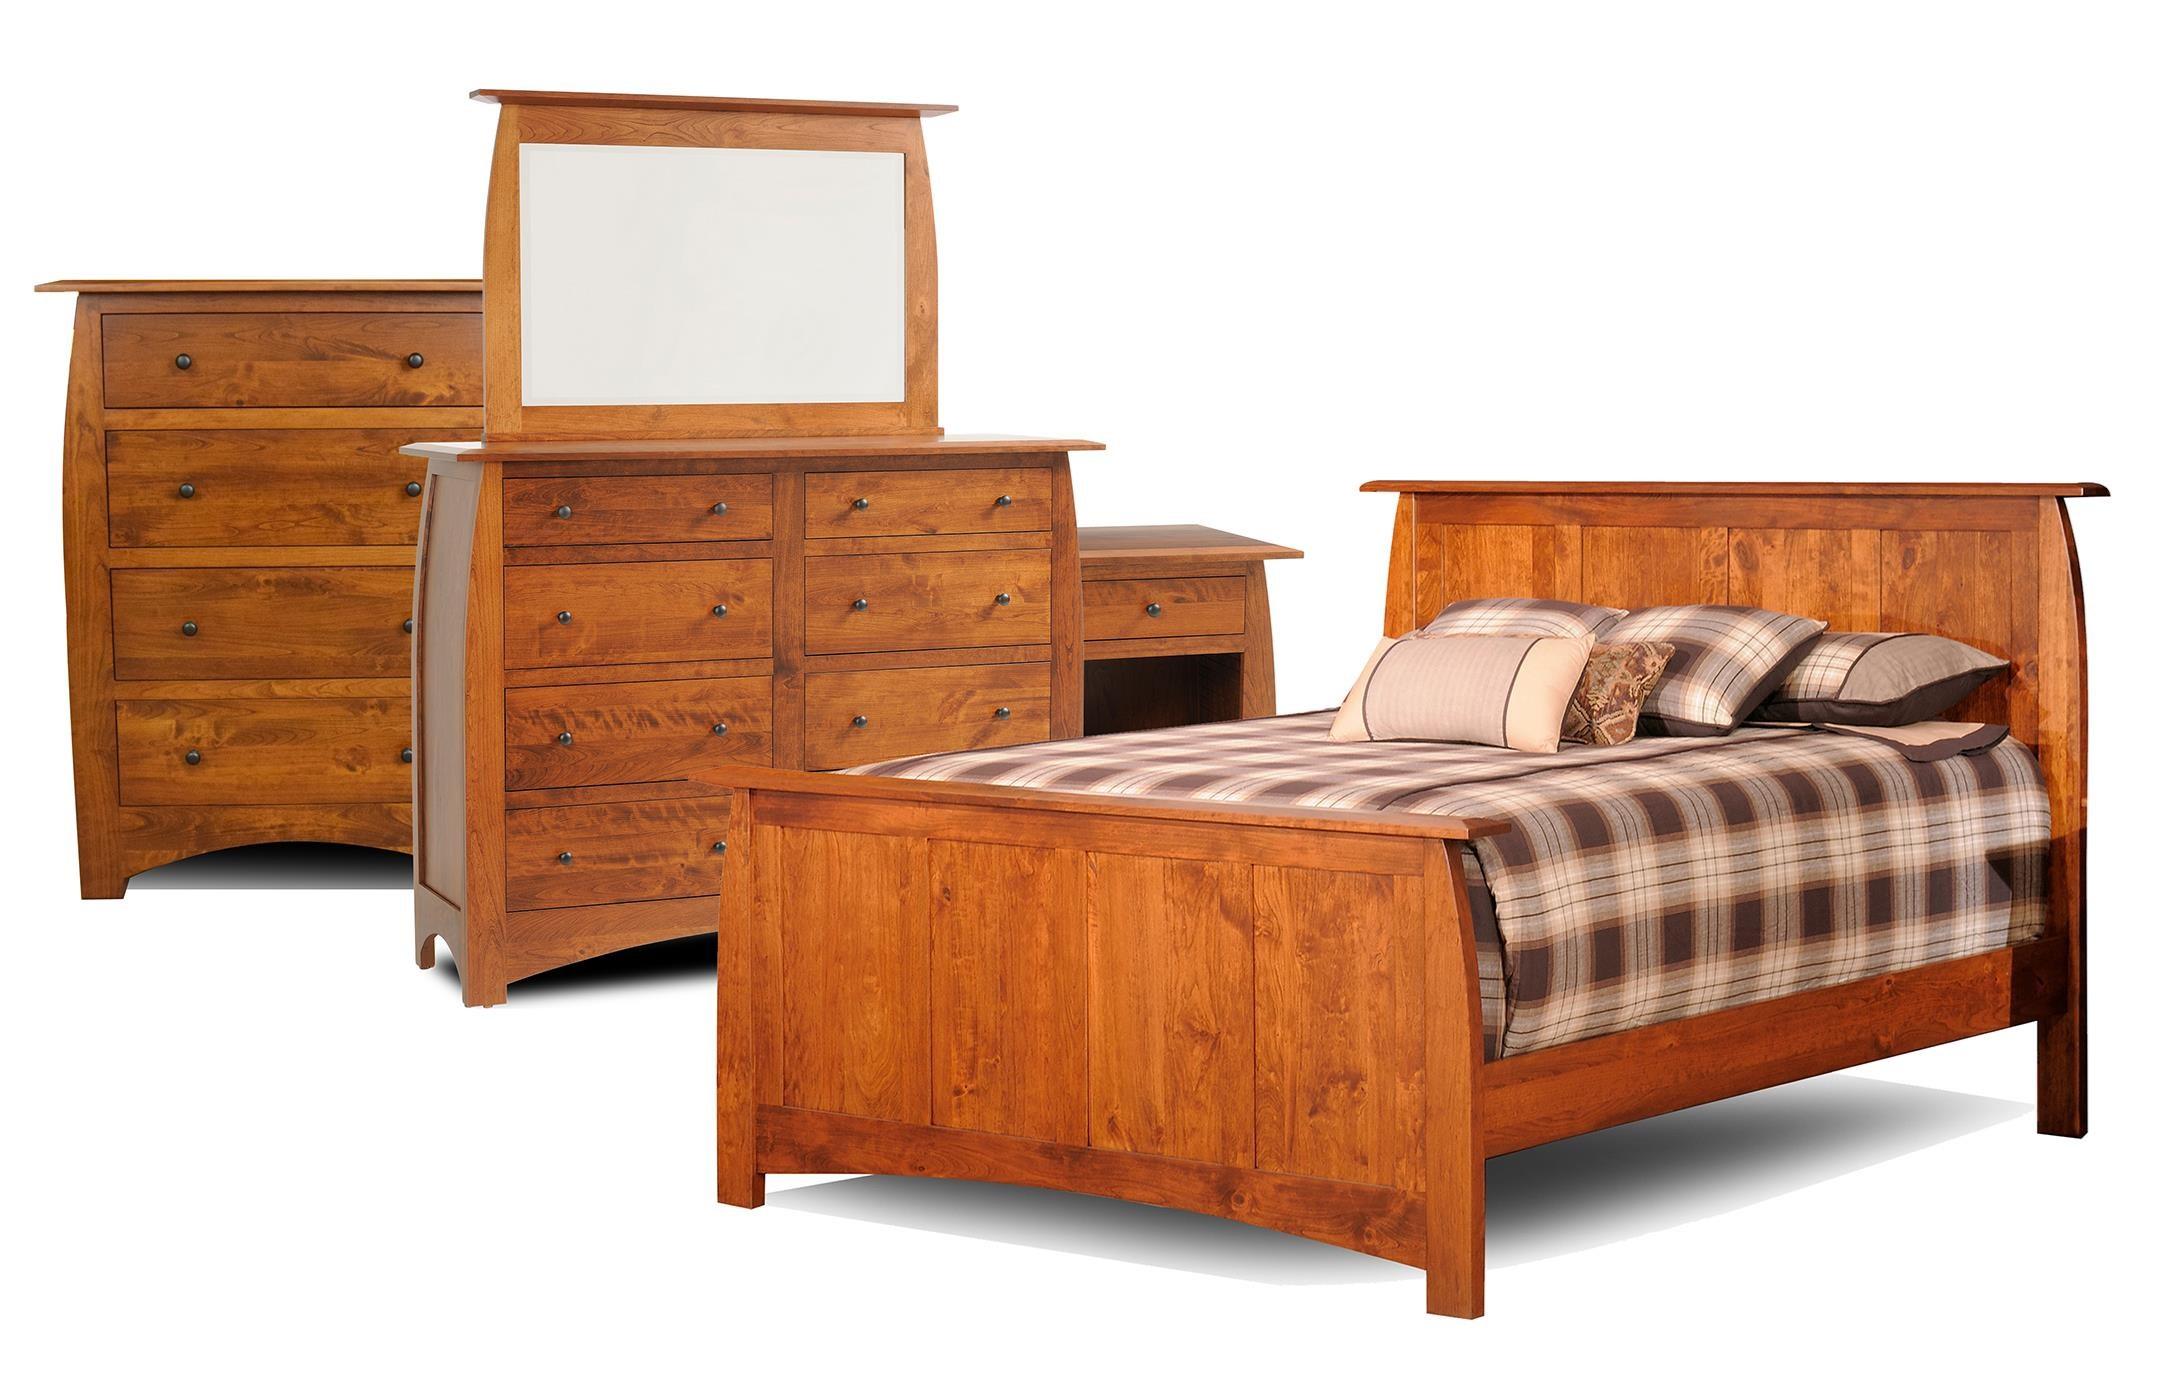 Millcraft Bordeaux 4 Piece King Bedroom Ruby Gordon Furniture Mattresses Bedroom Groups